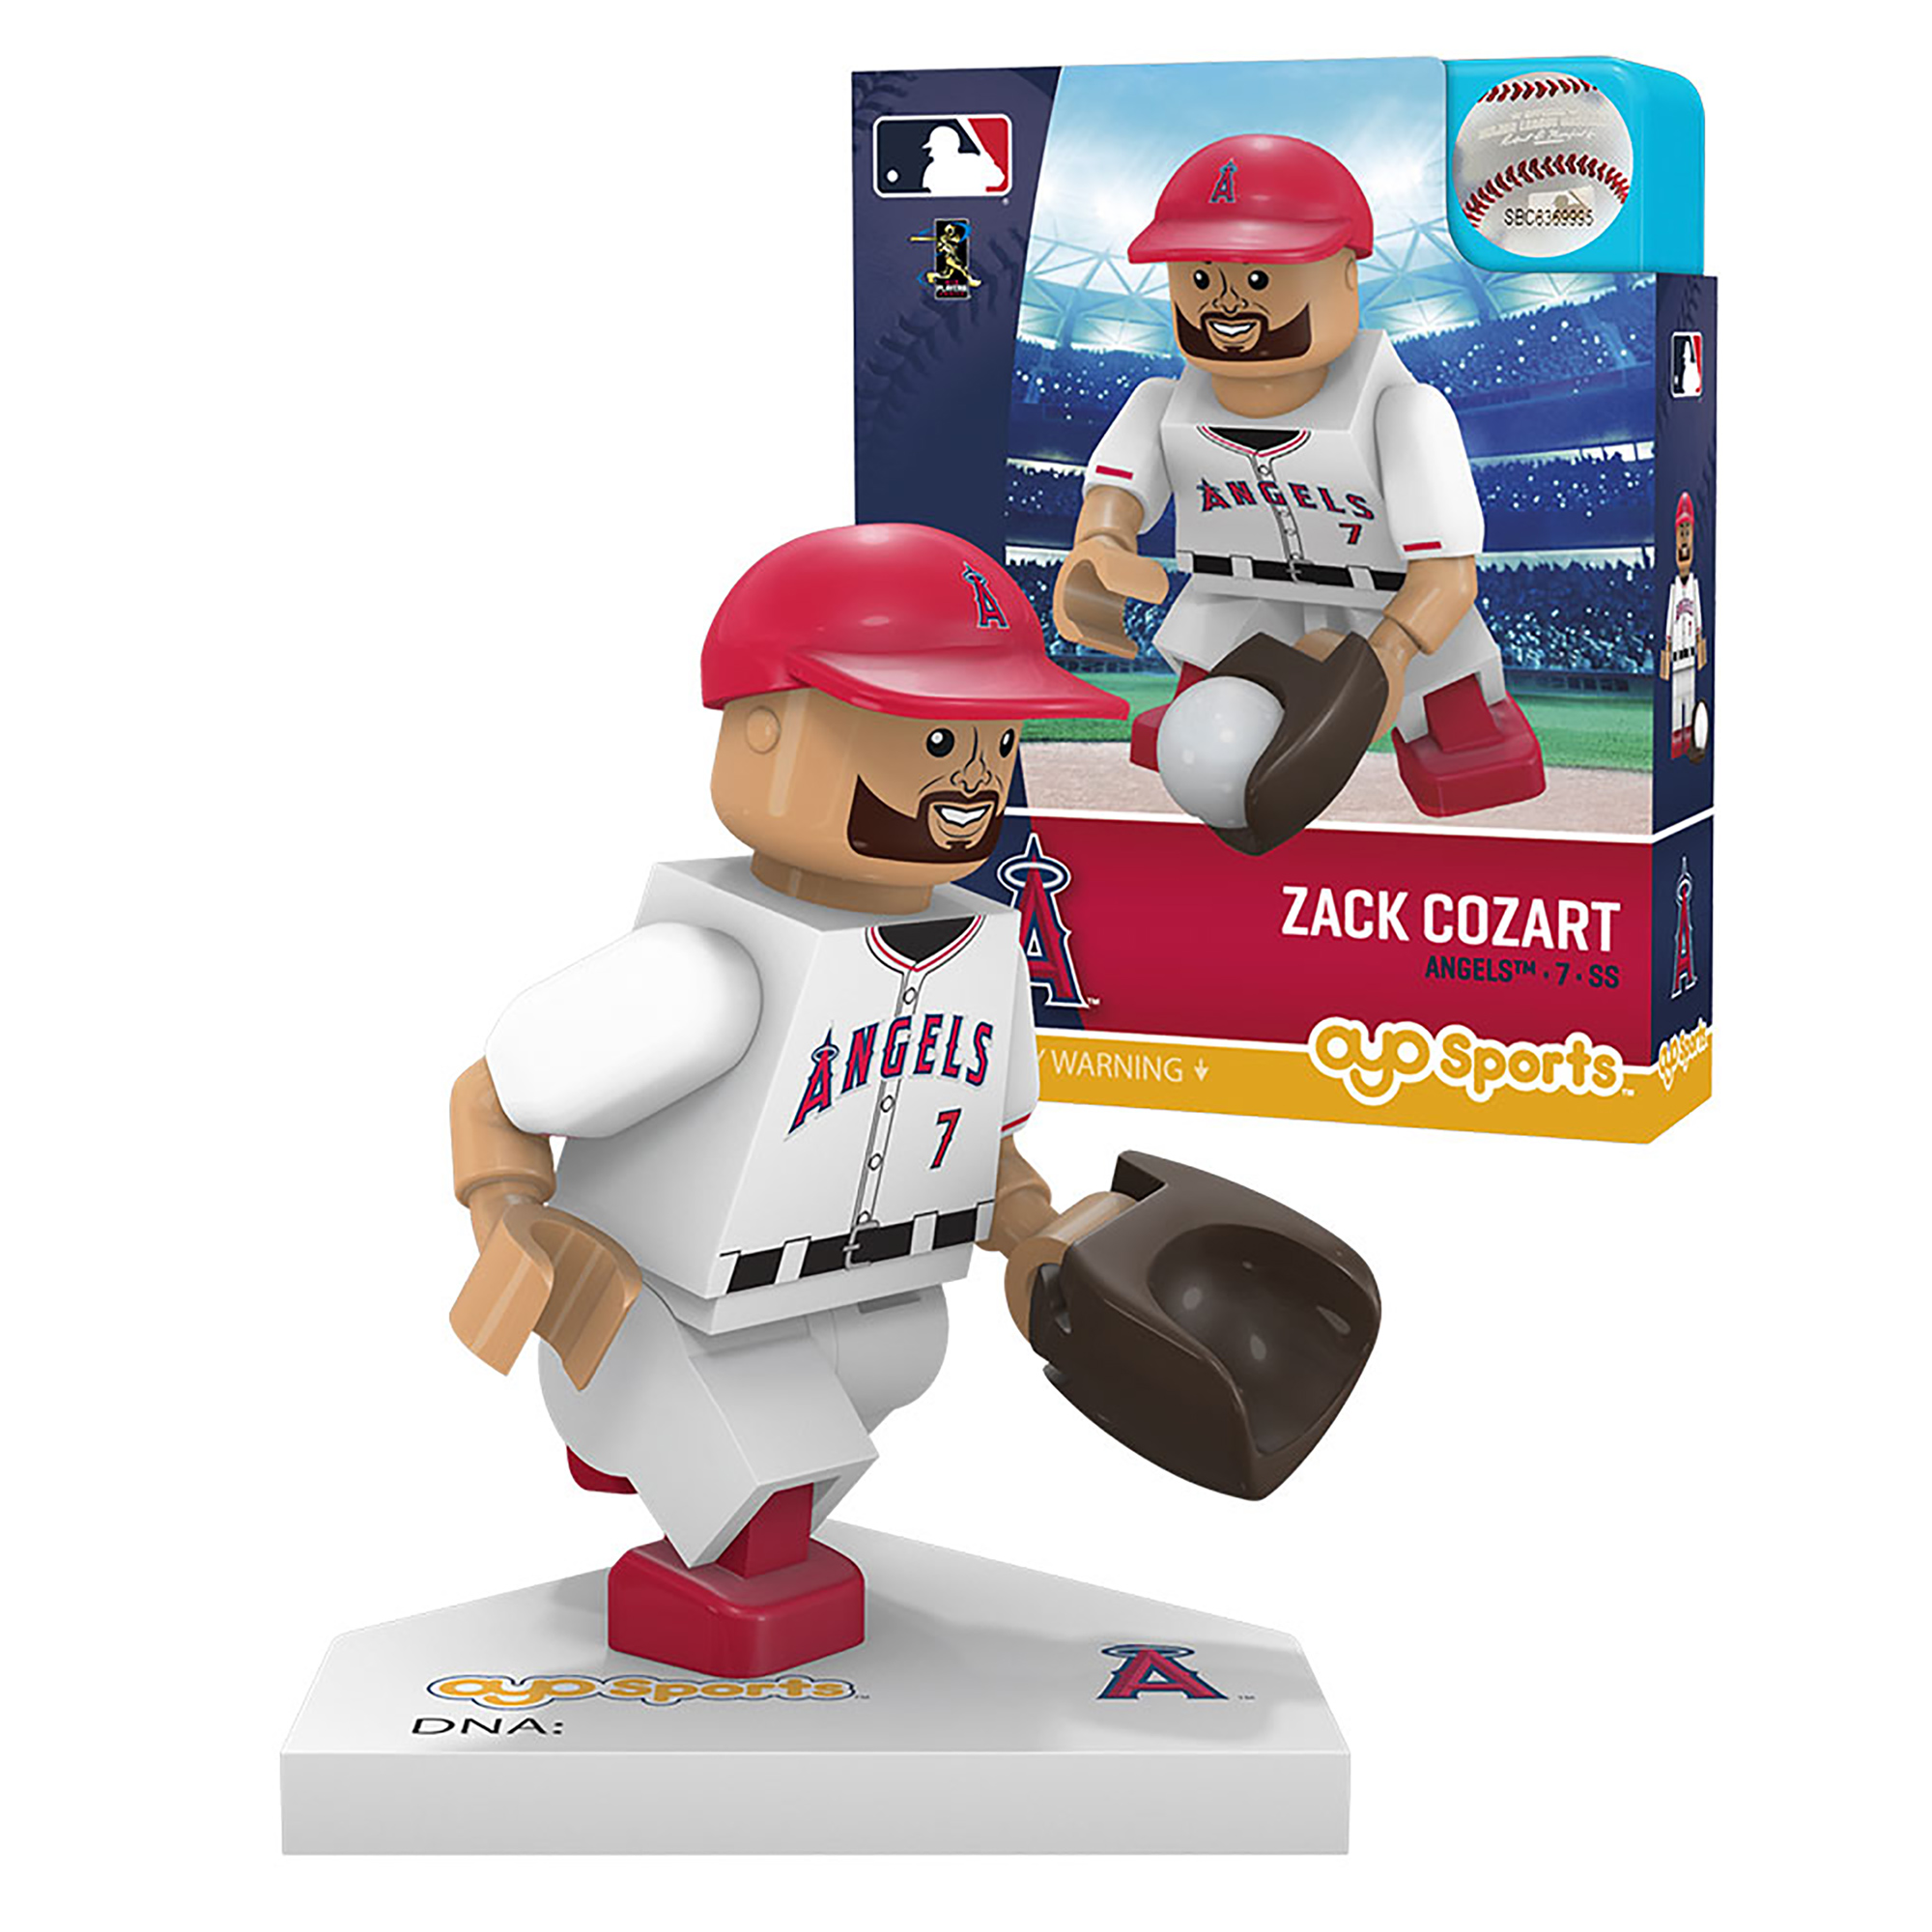 Zack Cozart Los Angeles Angels OYO Sports Player MLB Minifigure - No Size